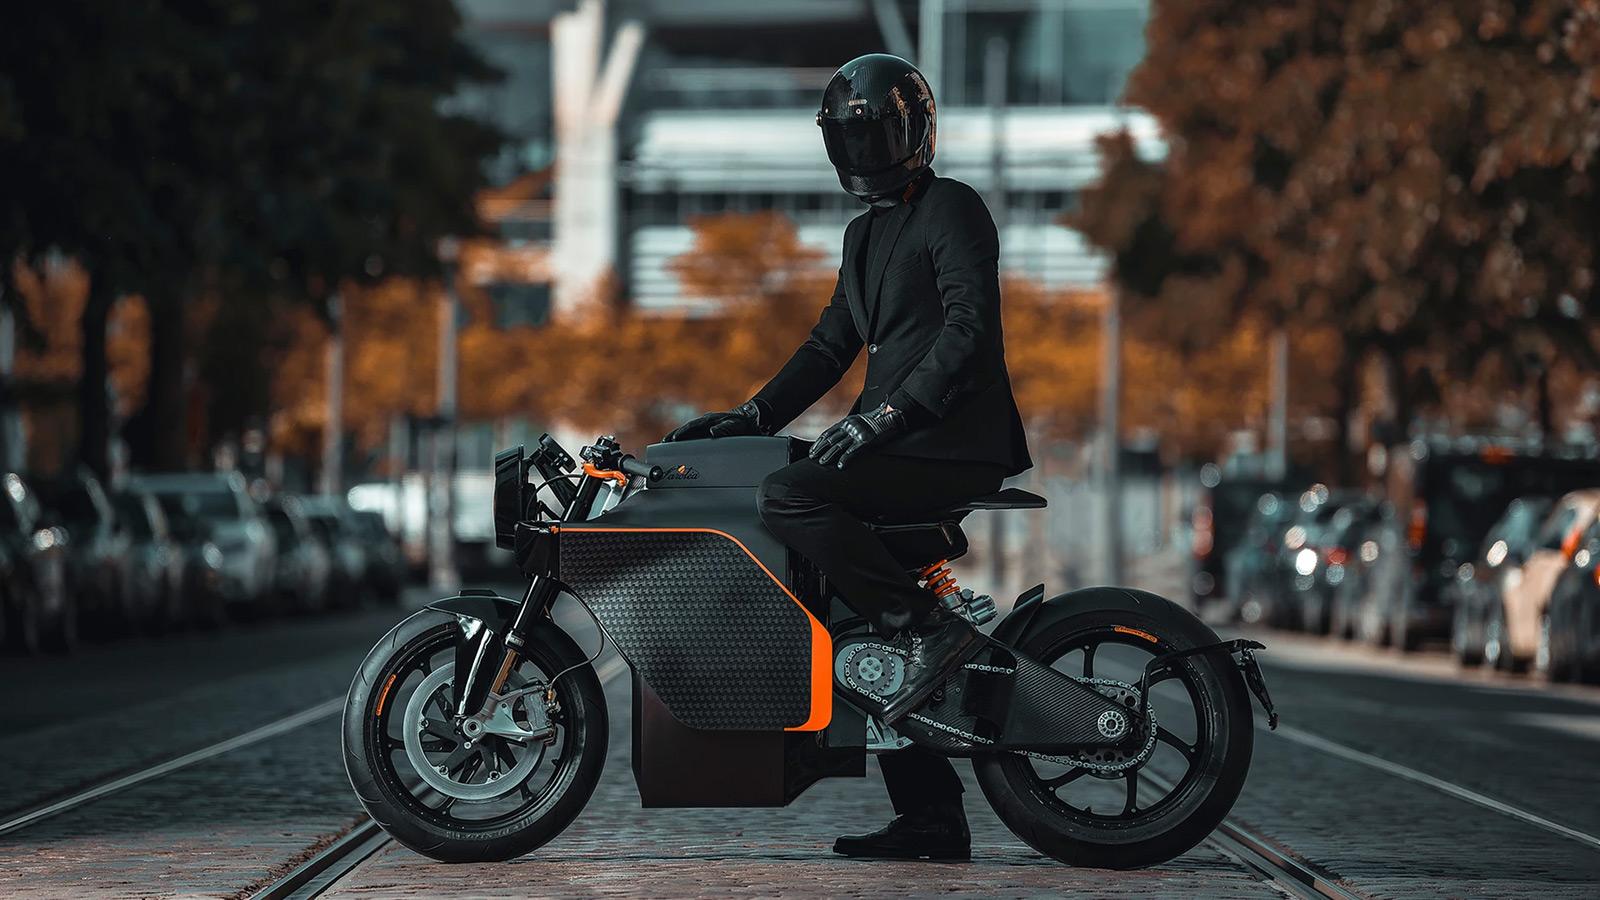 Saroléa x Mighty Machines N60 MM.01 Electric Motorcycle